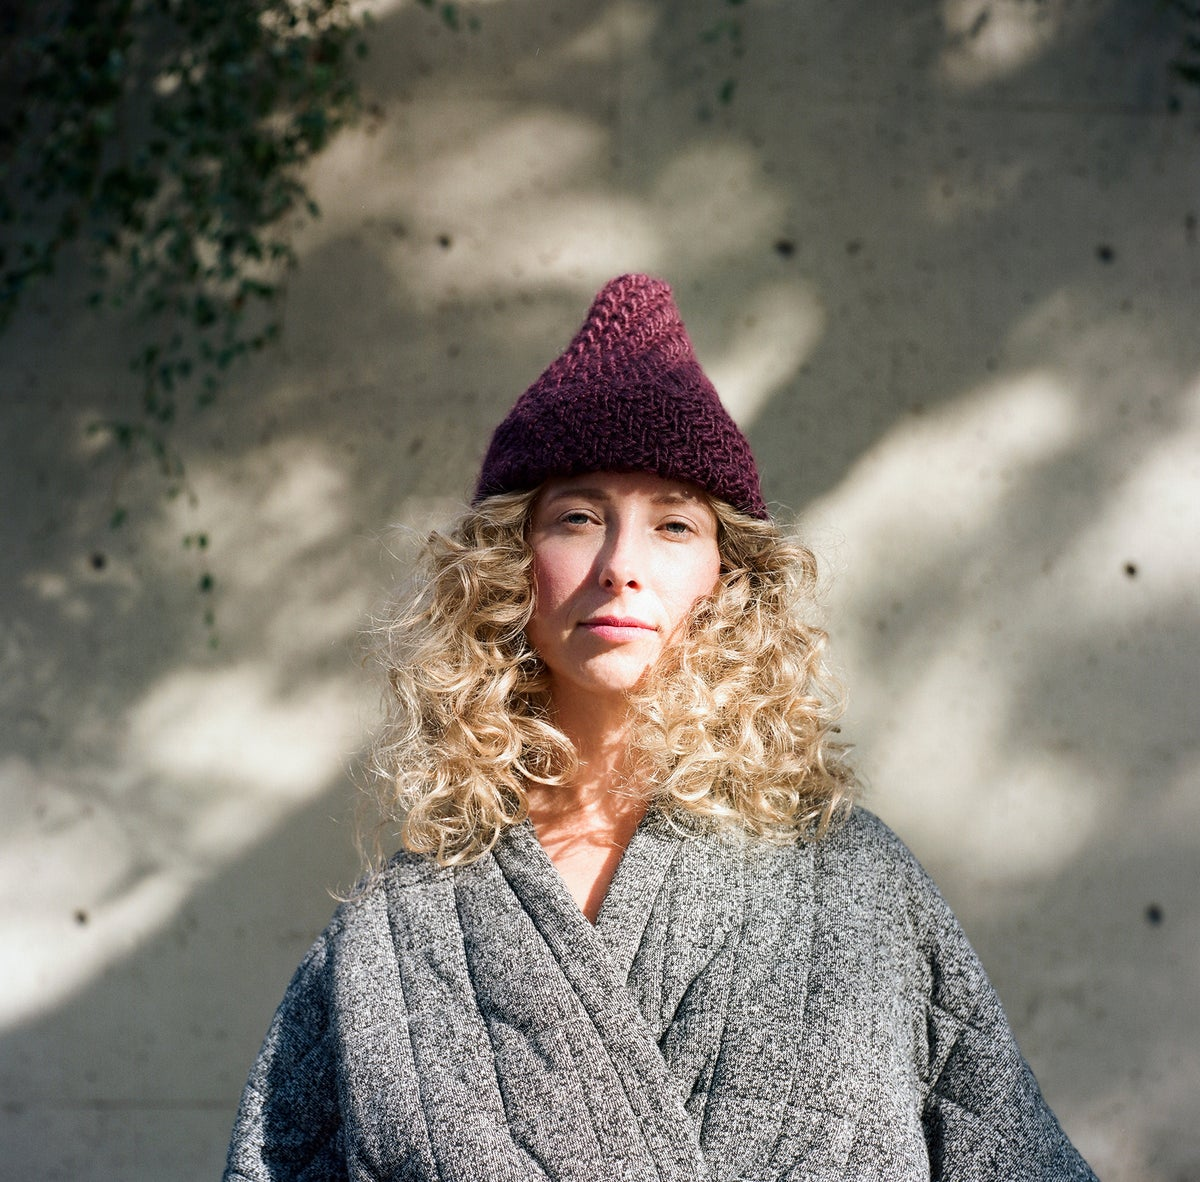 Image of Lanark diagonal ribbed toque of silk + alpaca + merino wool (shown in dark plum)